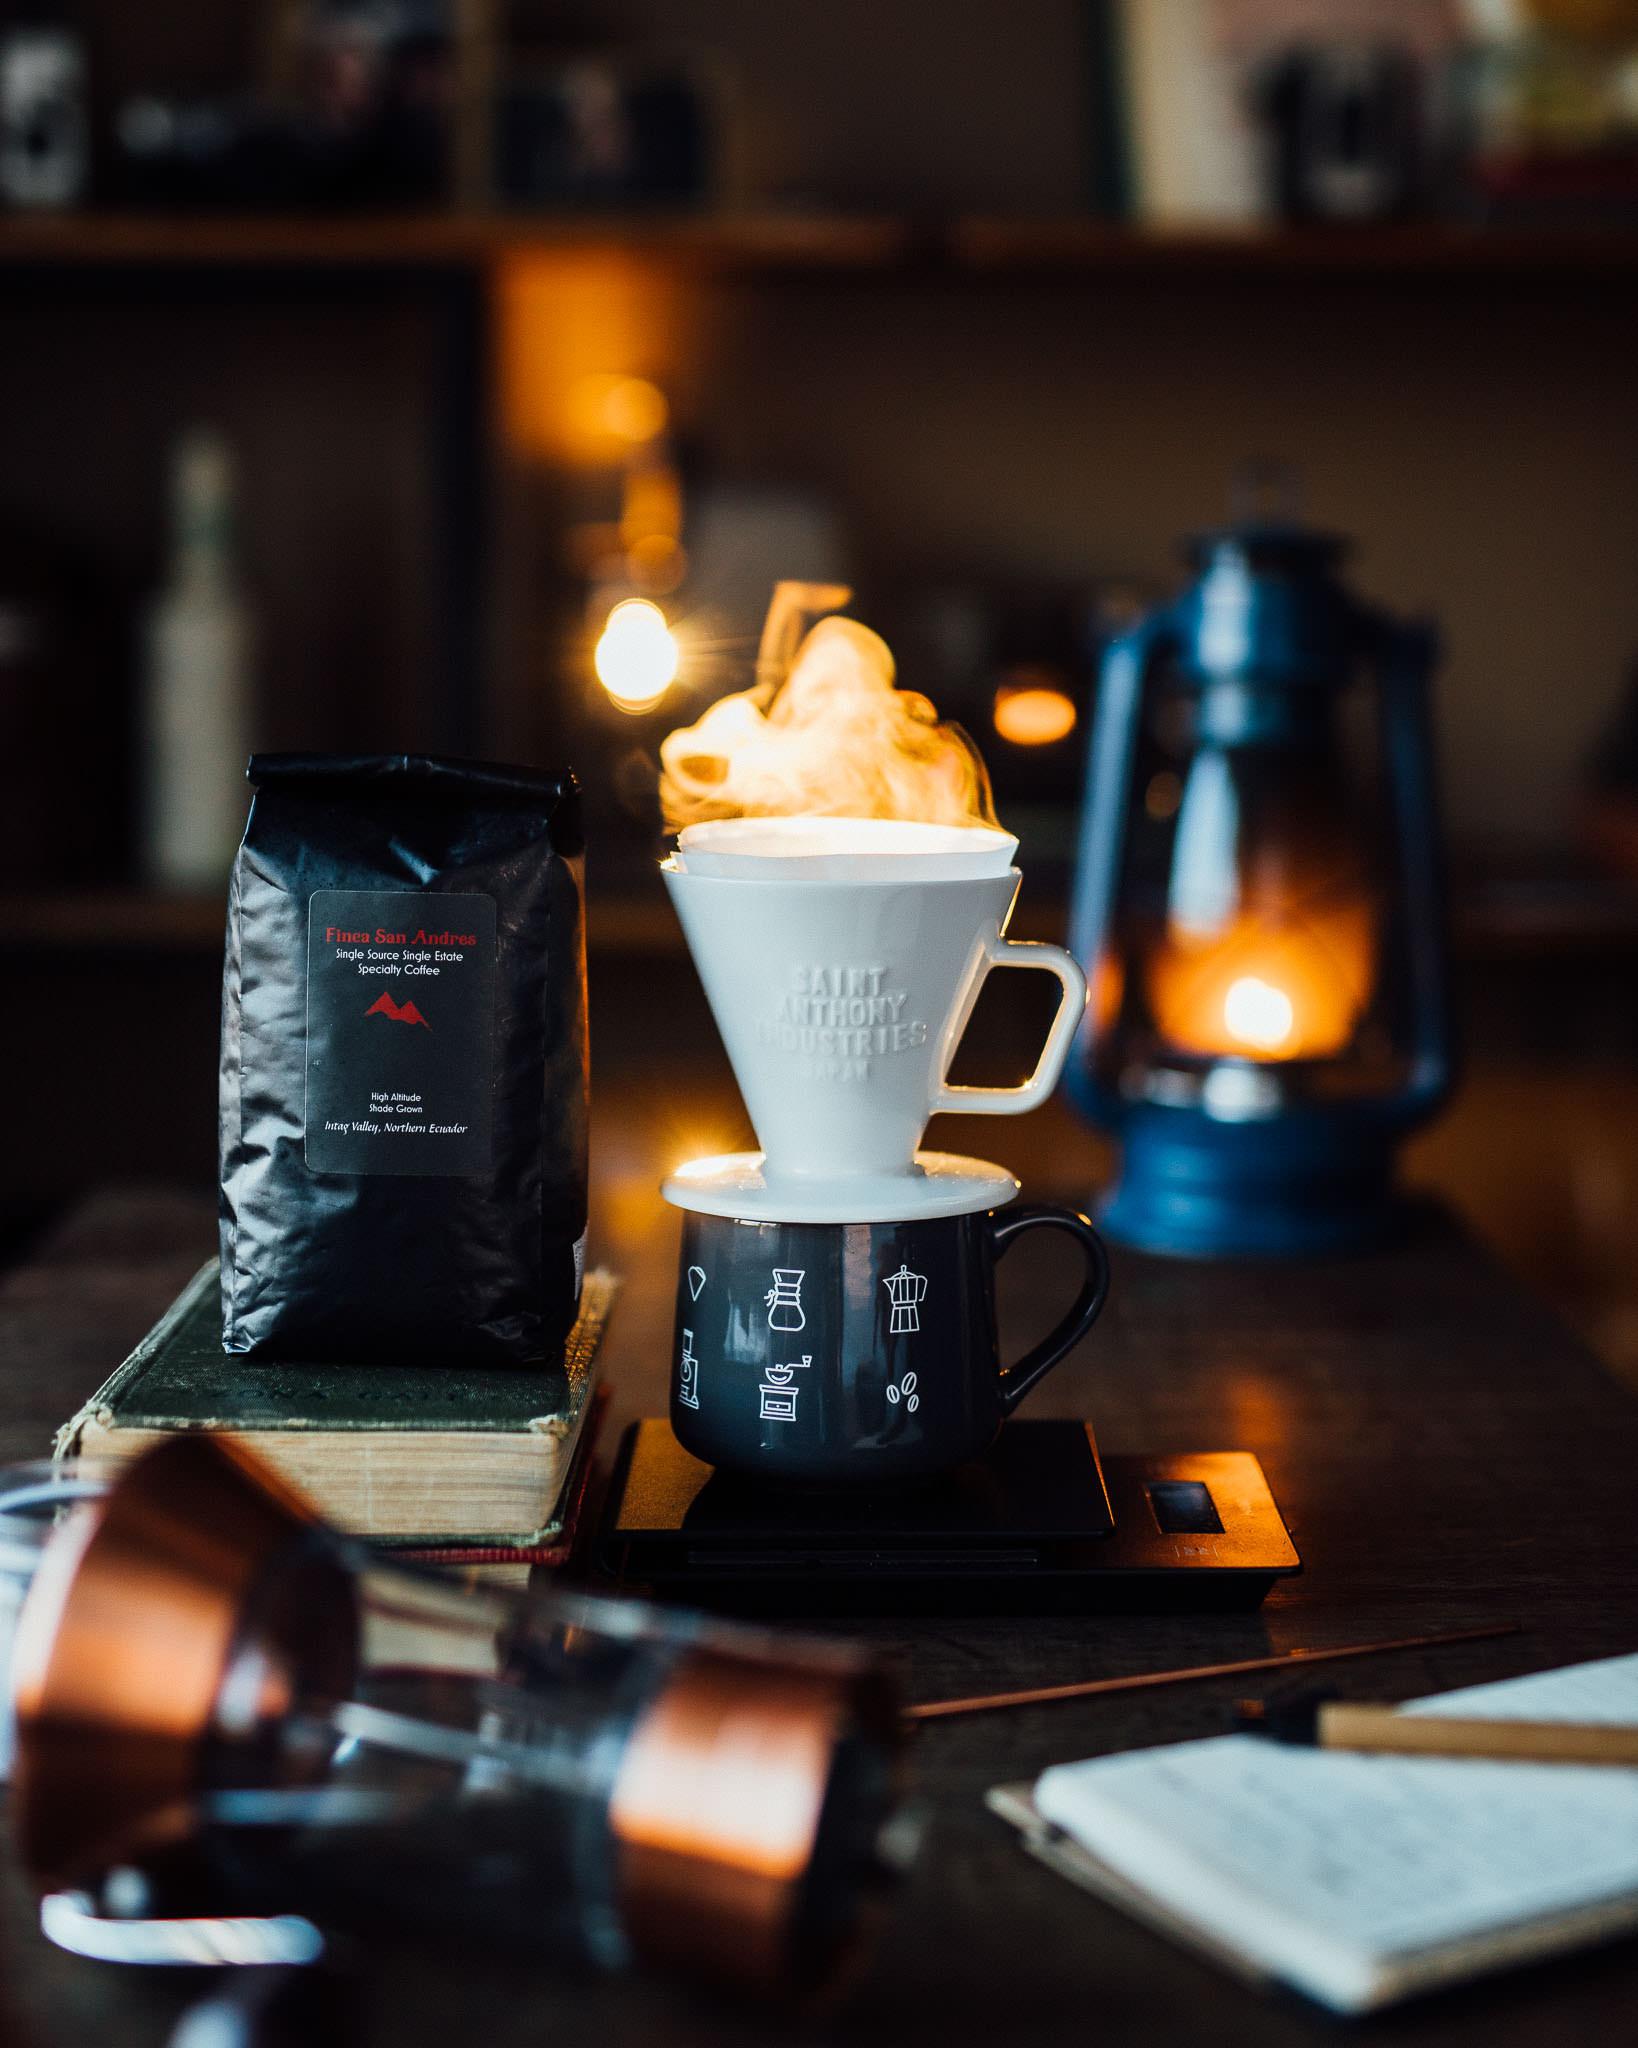 Specialty quality coffee from Ecuador